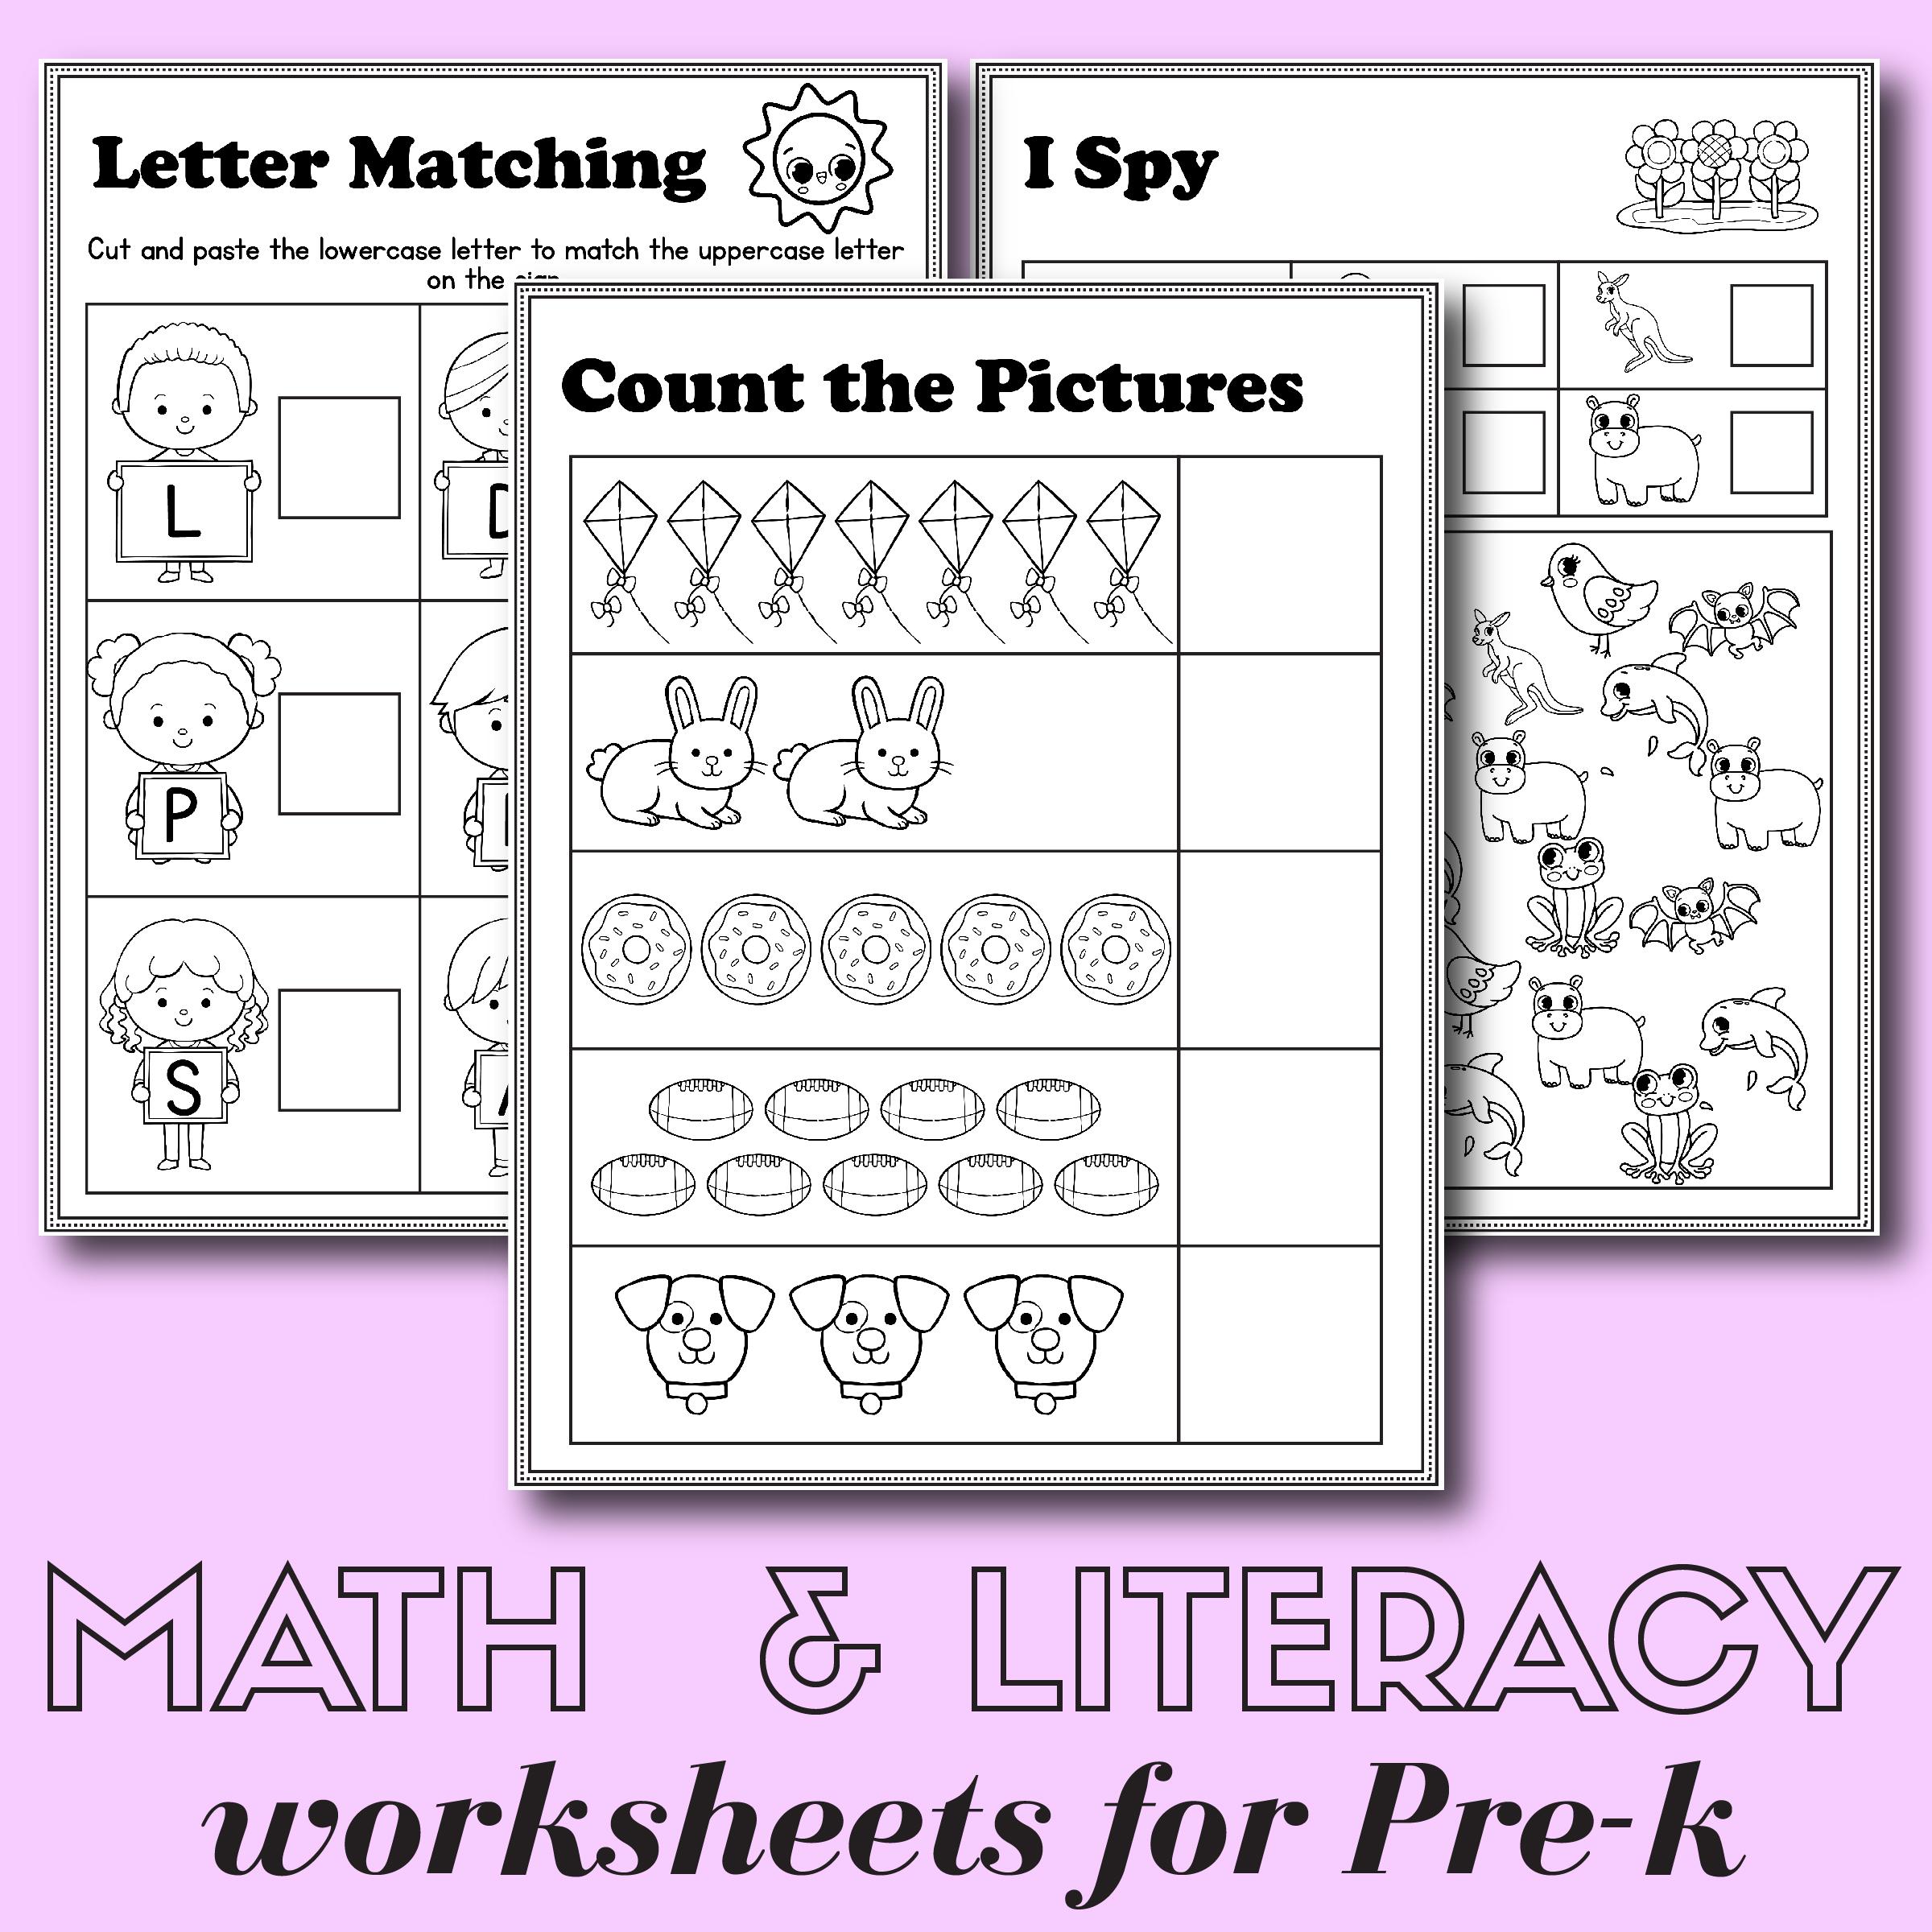 Preschool Math And Literacy Worksheets - Free Printables